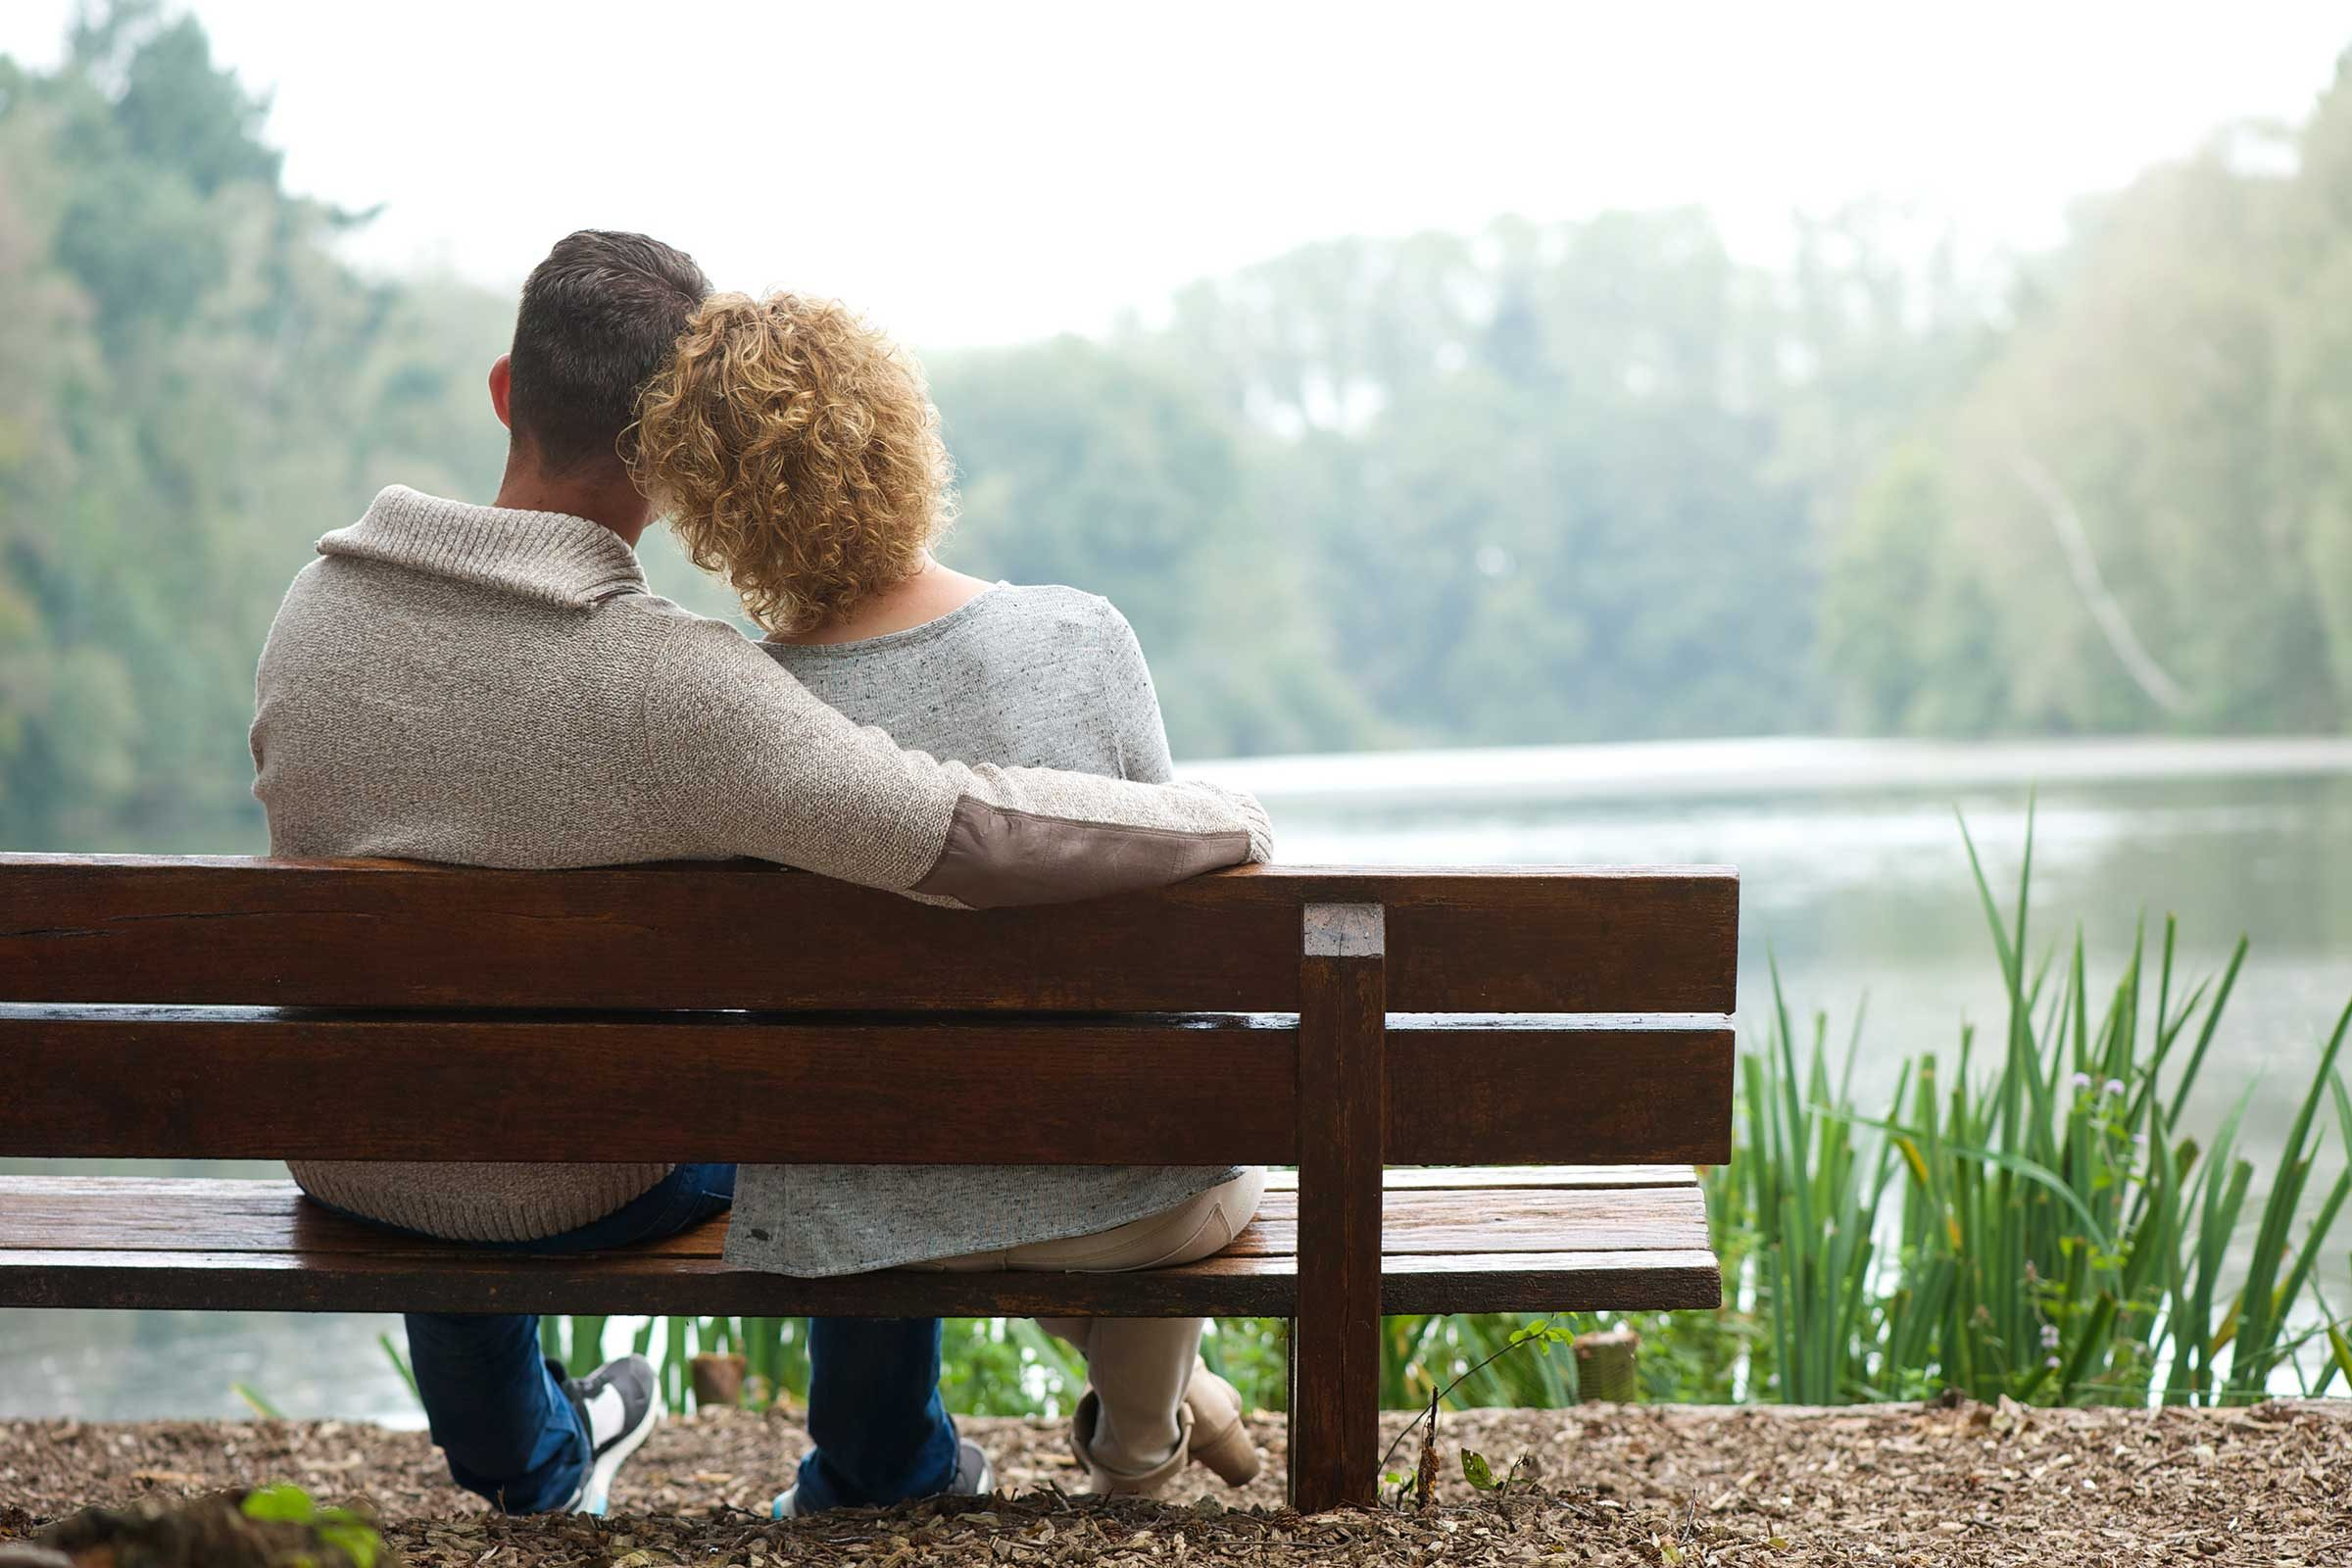 One Year Wedding Anniversary Ideas 97 Epic Observe marriage milestones